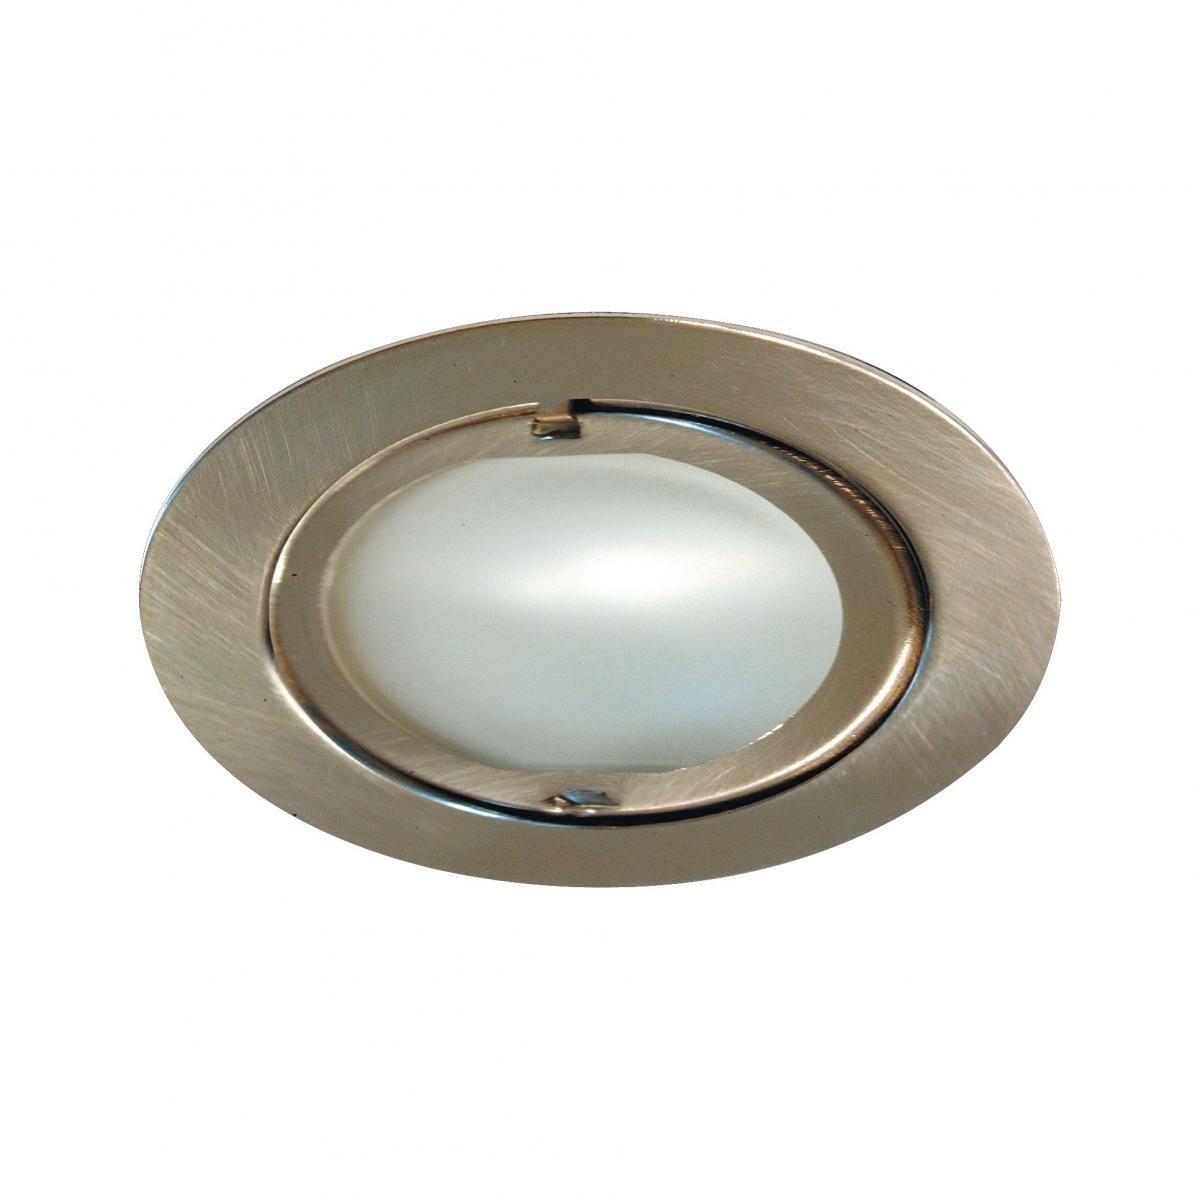 meubelinbouwspot metaal geborsteld incl 12v led lamp 12w g4 fitting